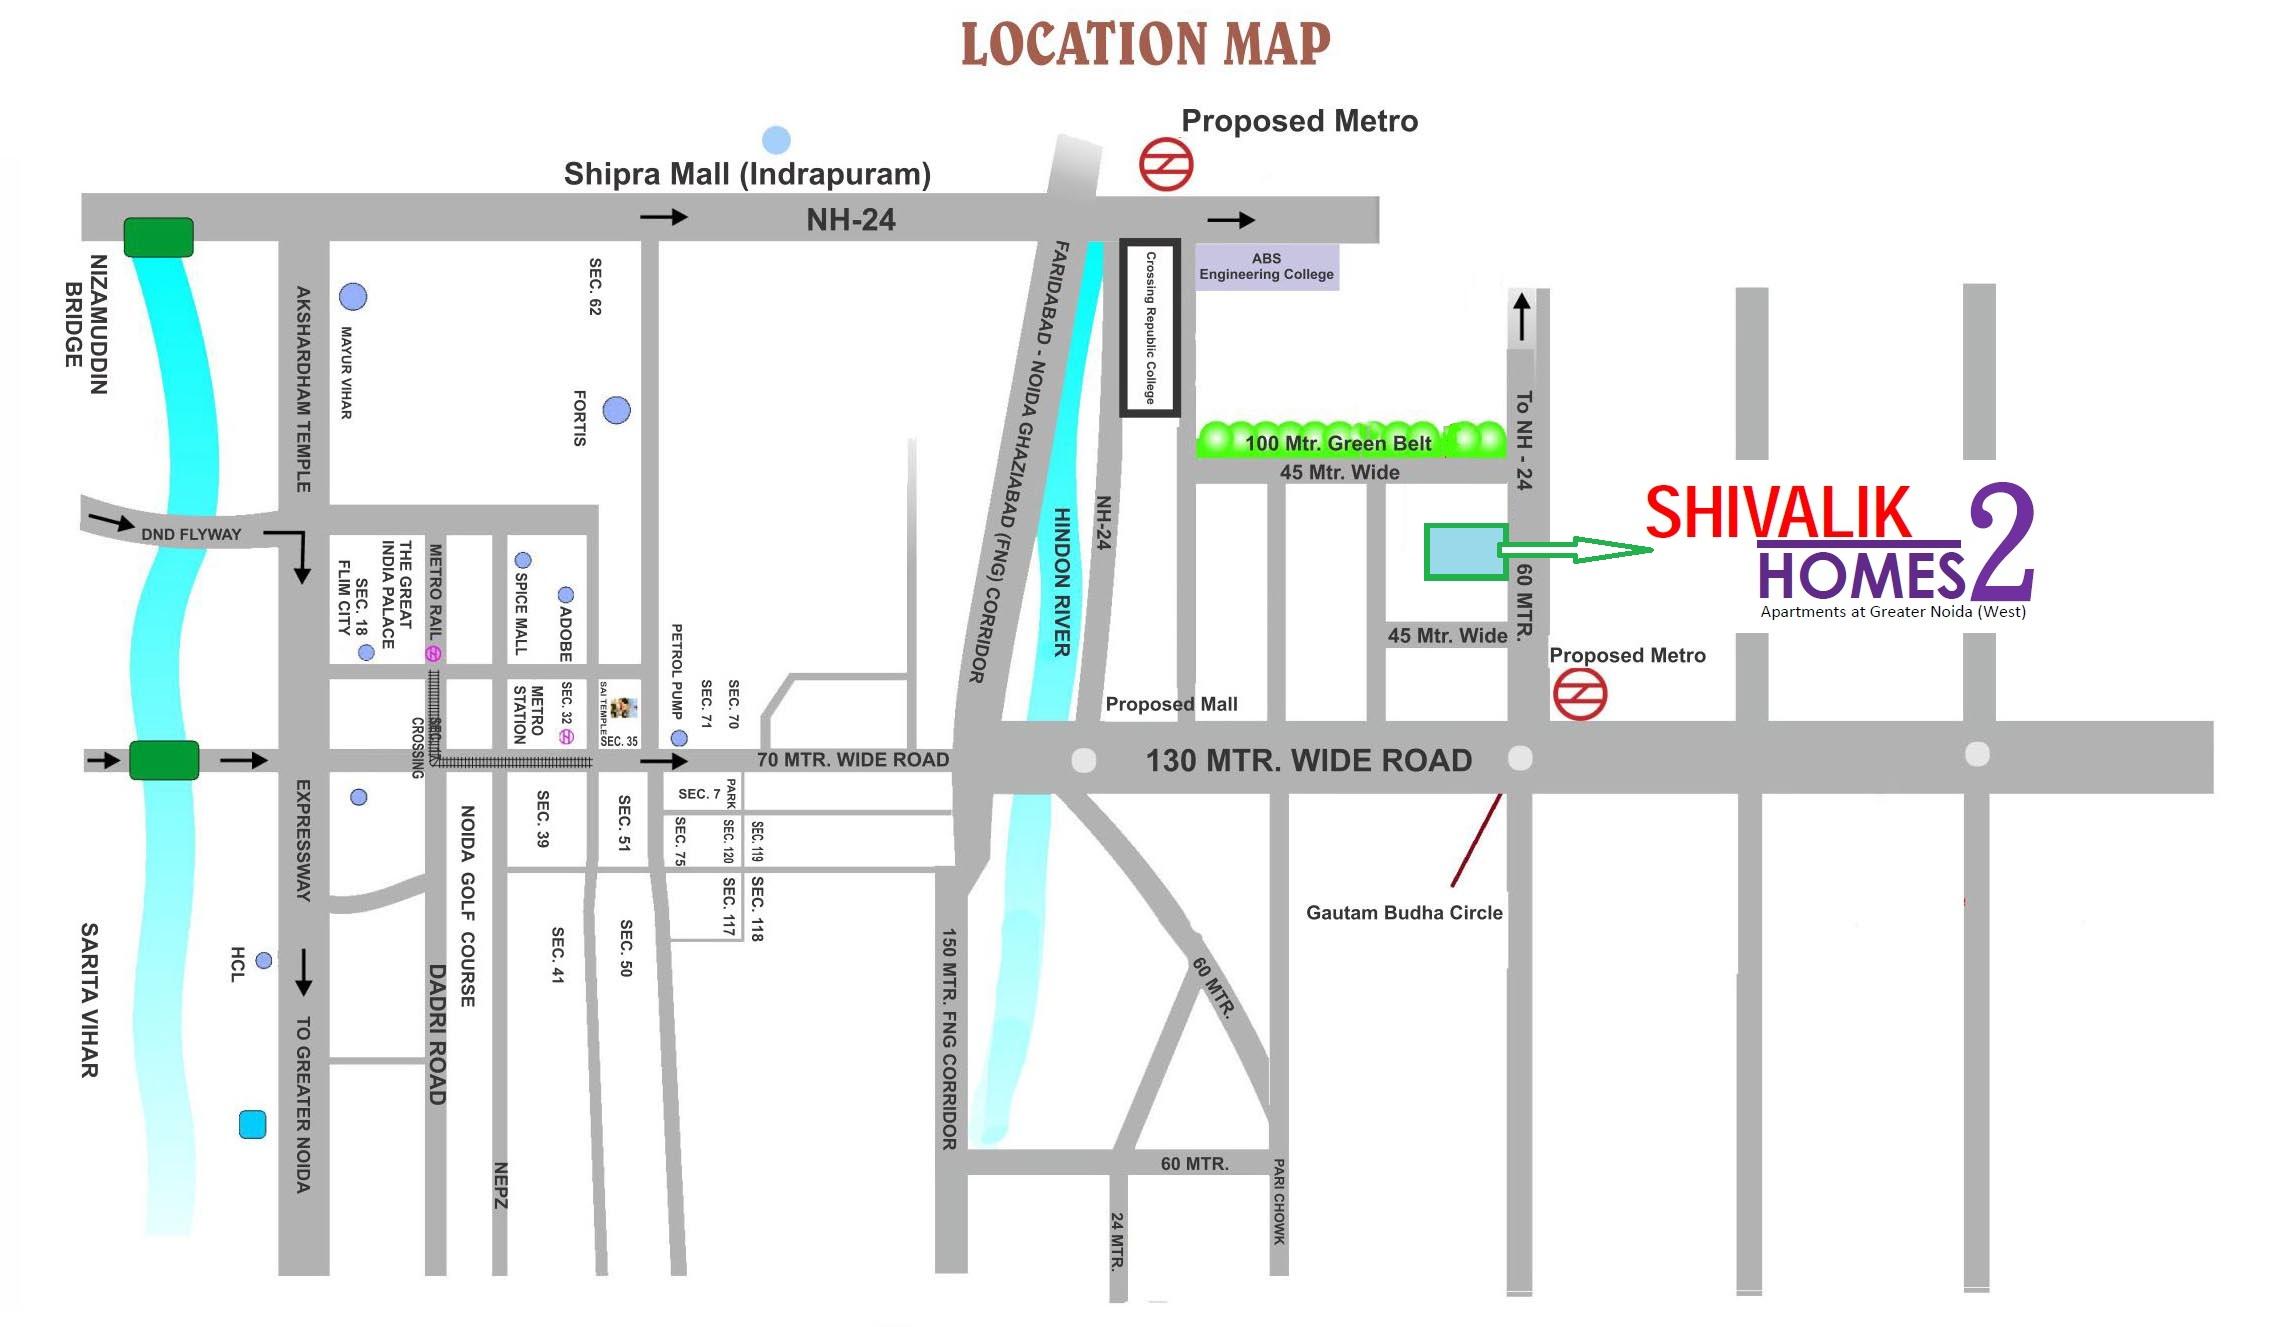 cosmos shivalik homes 2 location image1